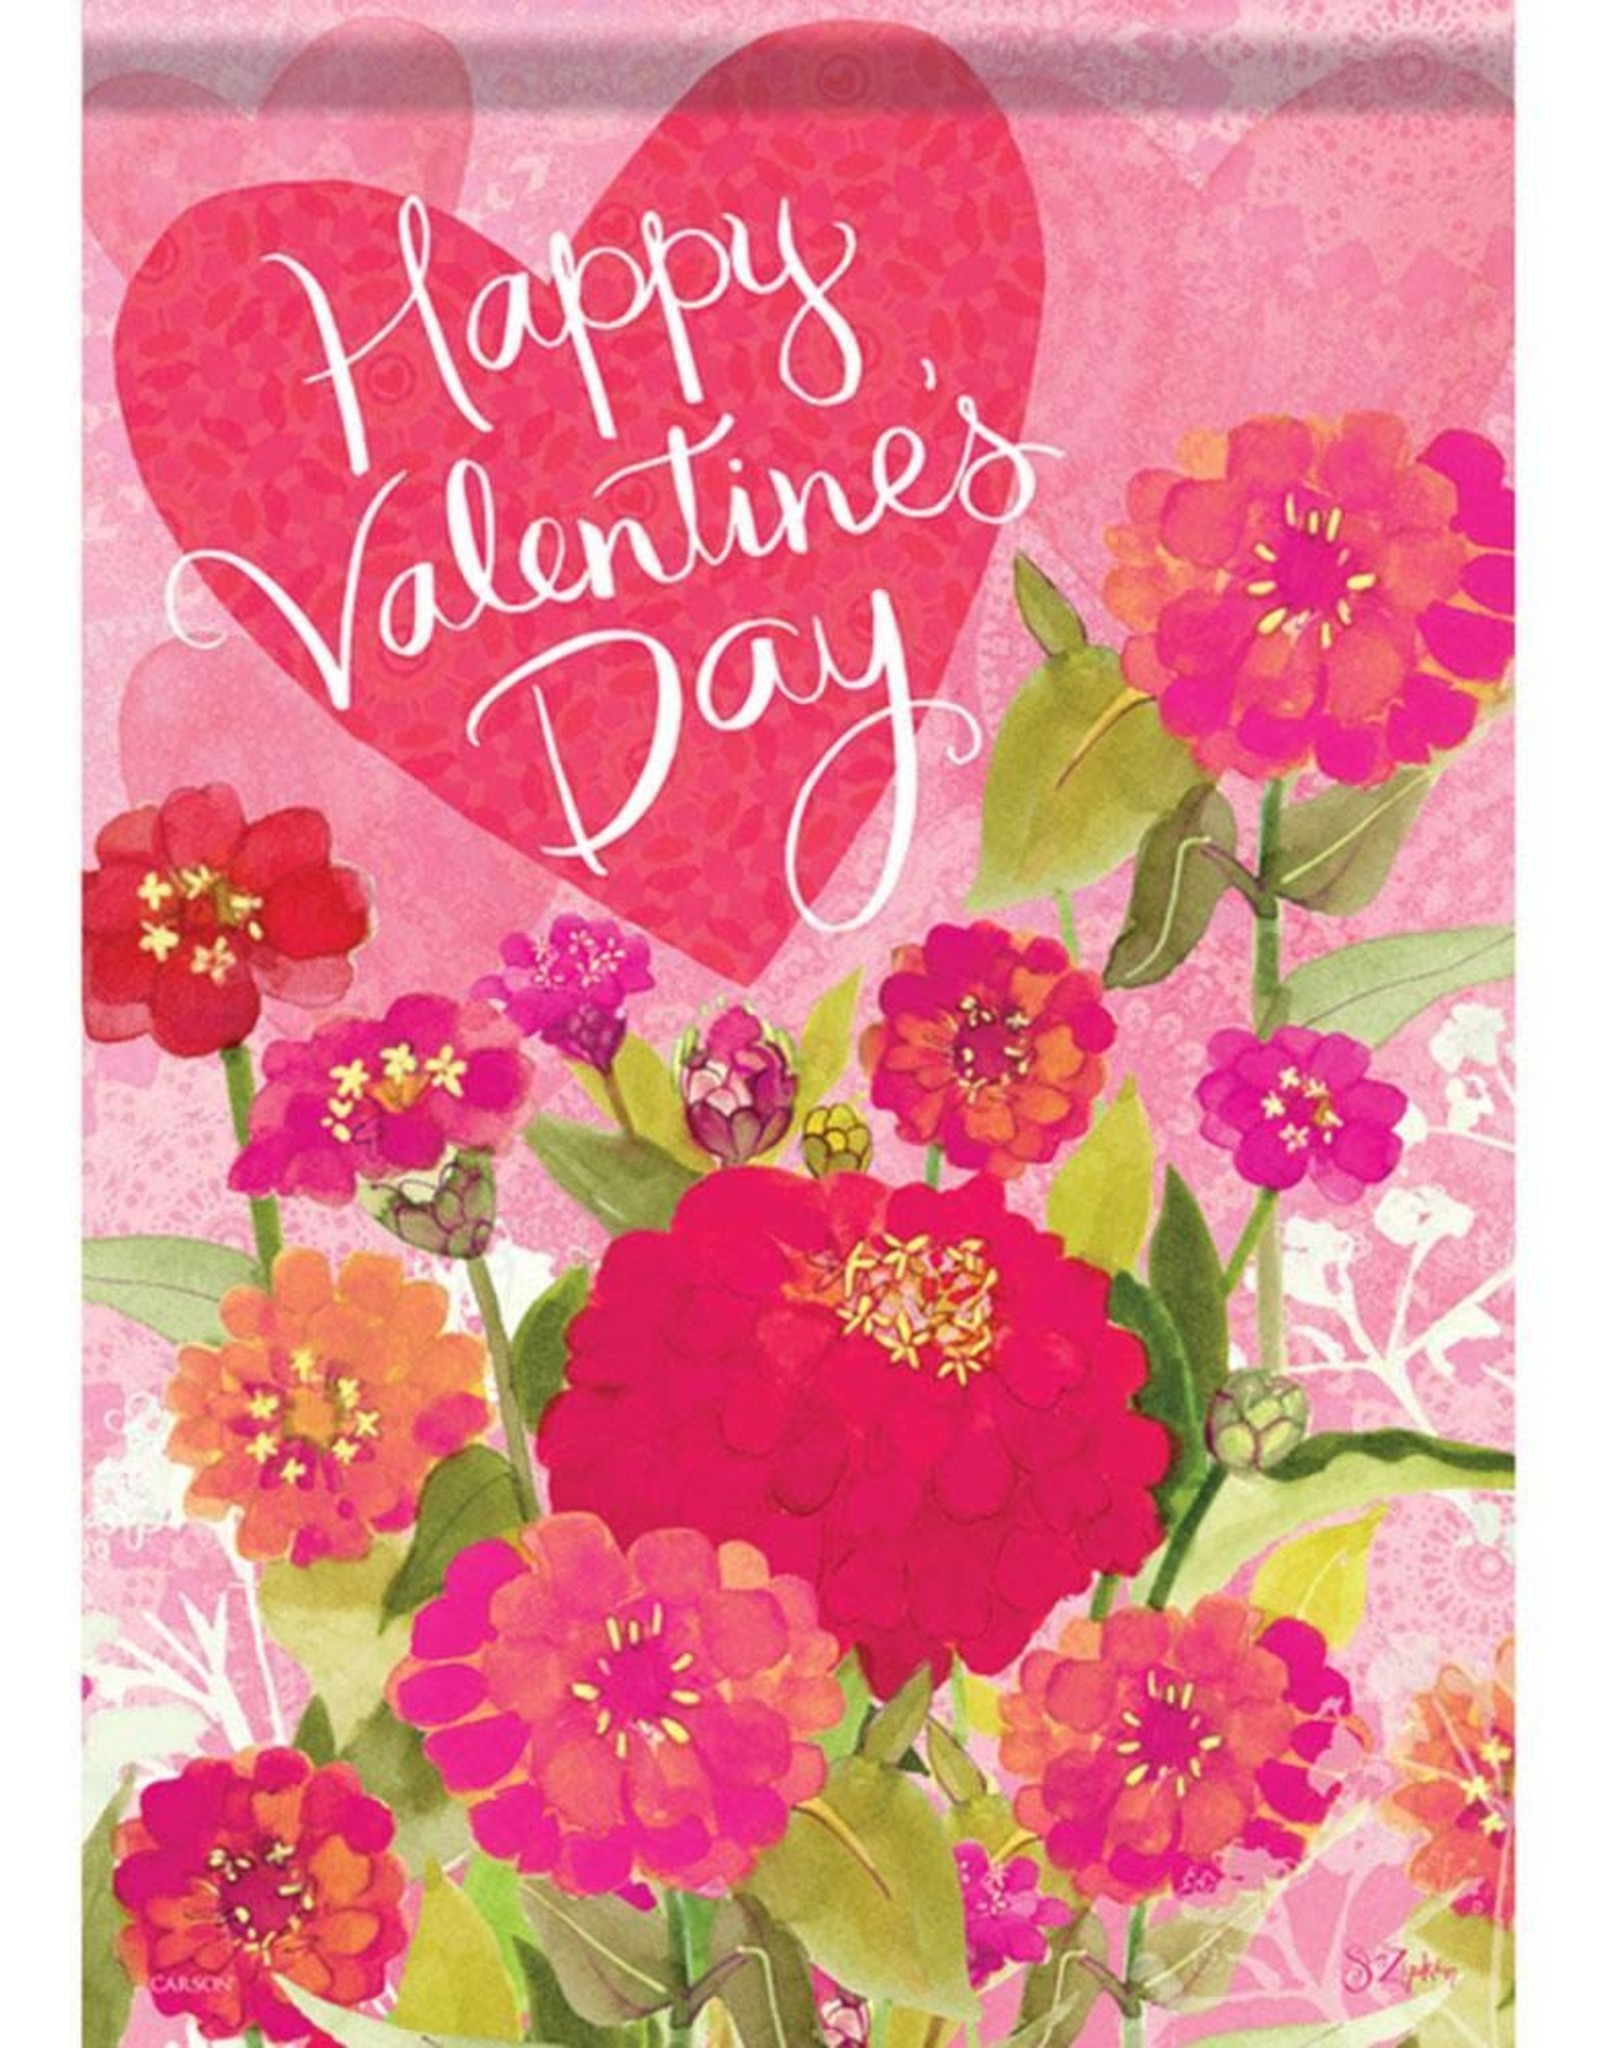 Carson C Valentine Zinnias